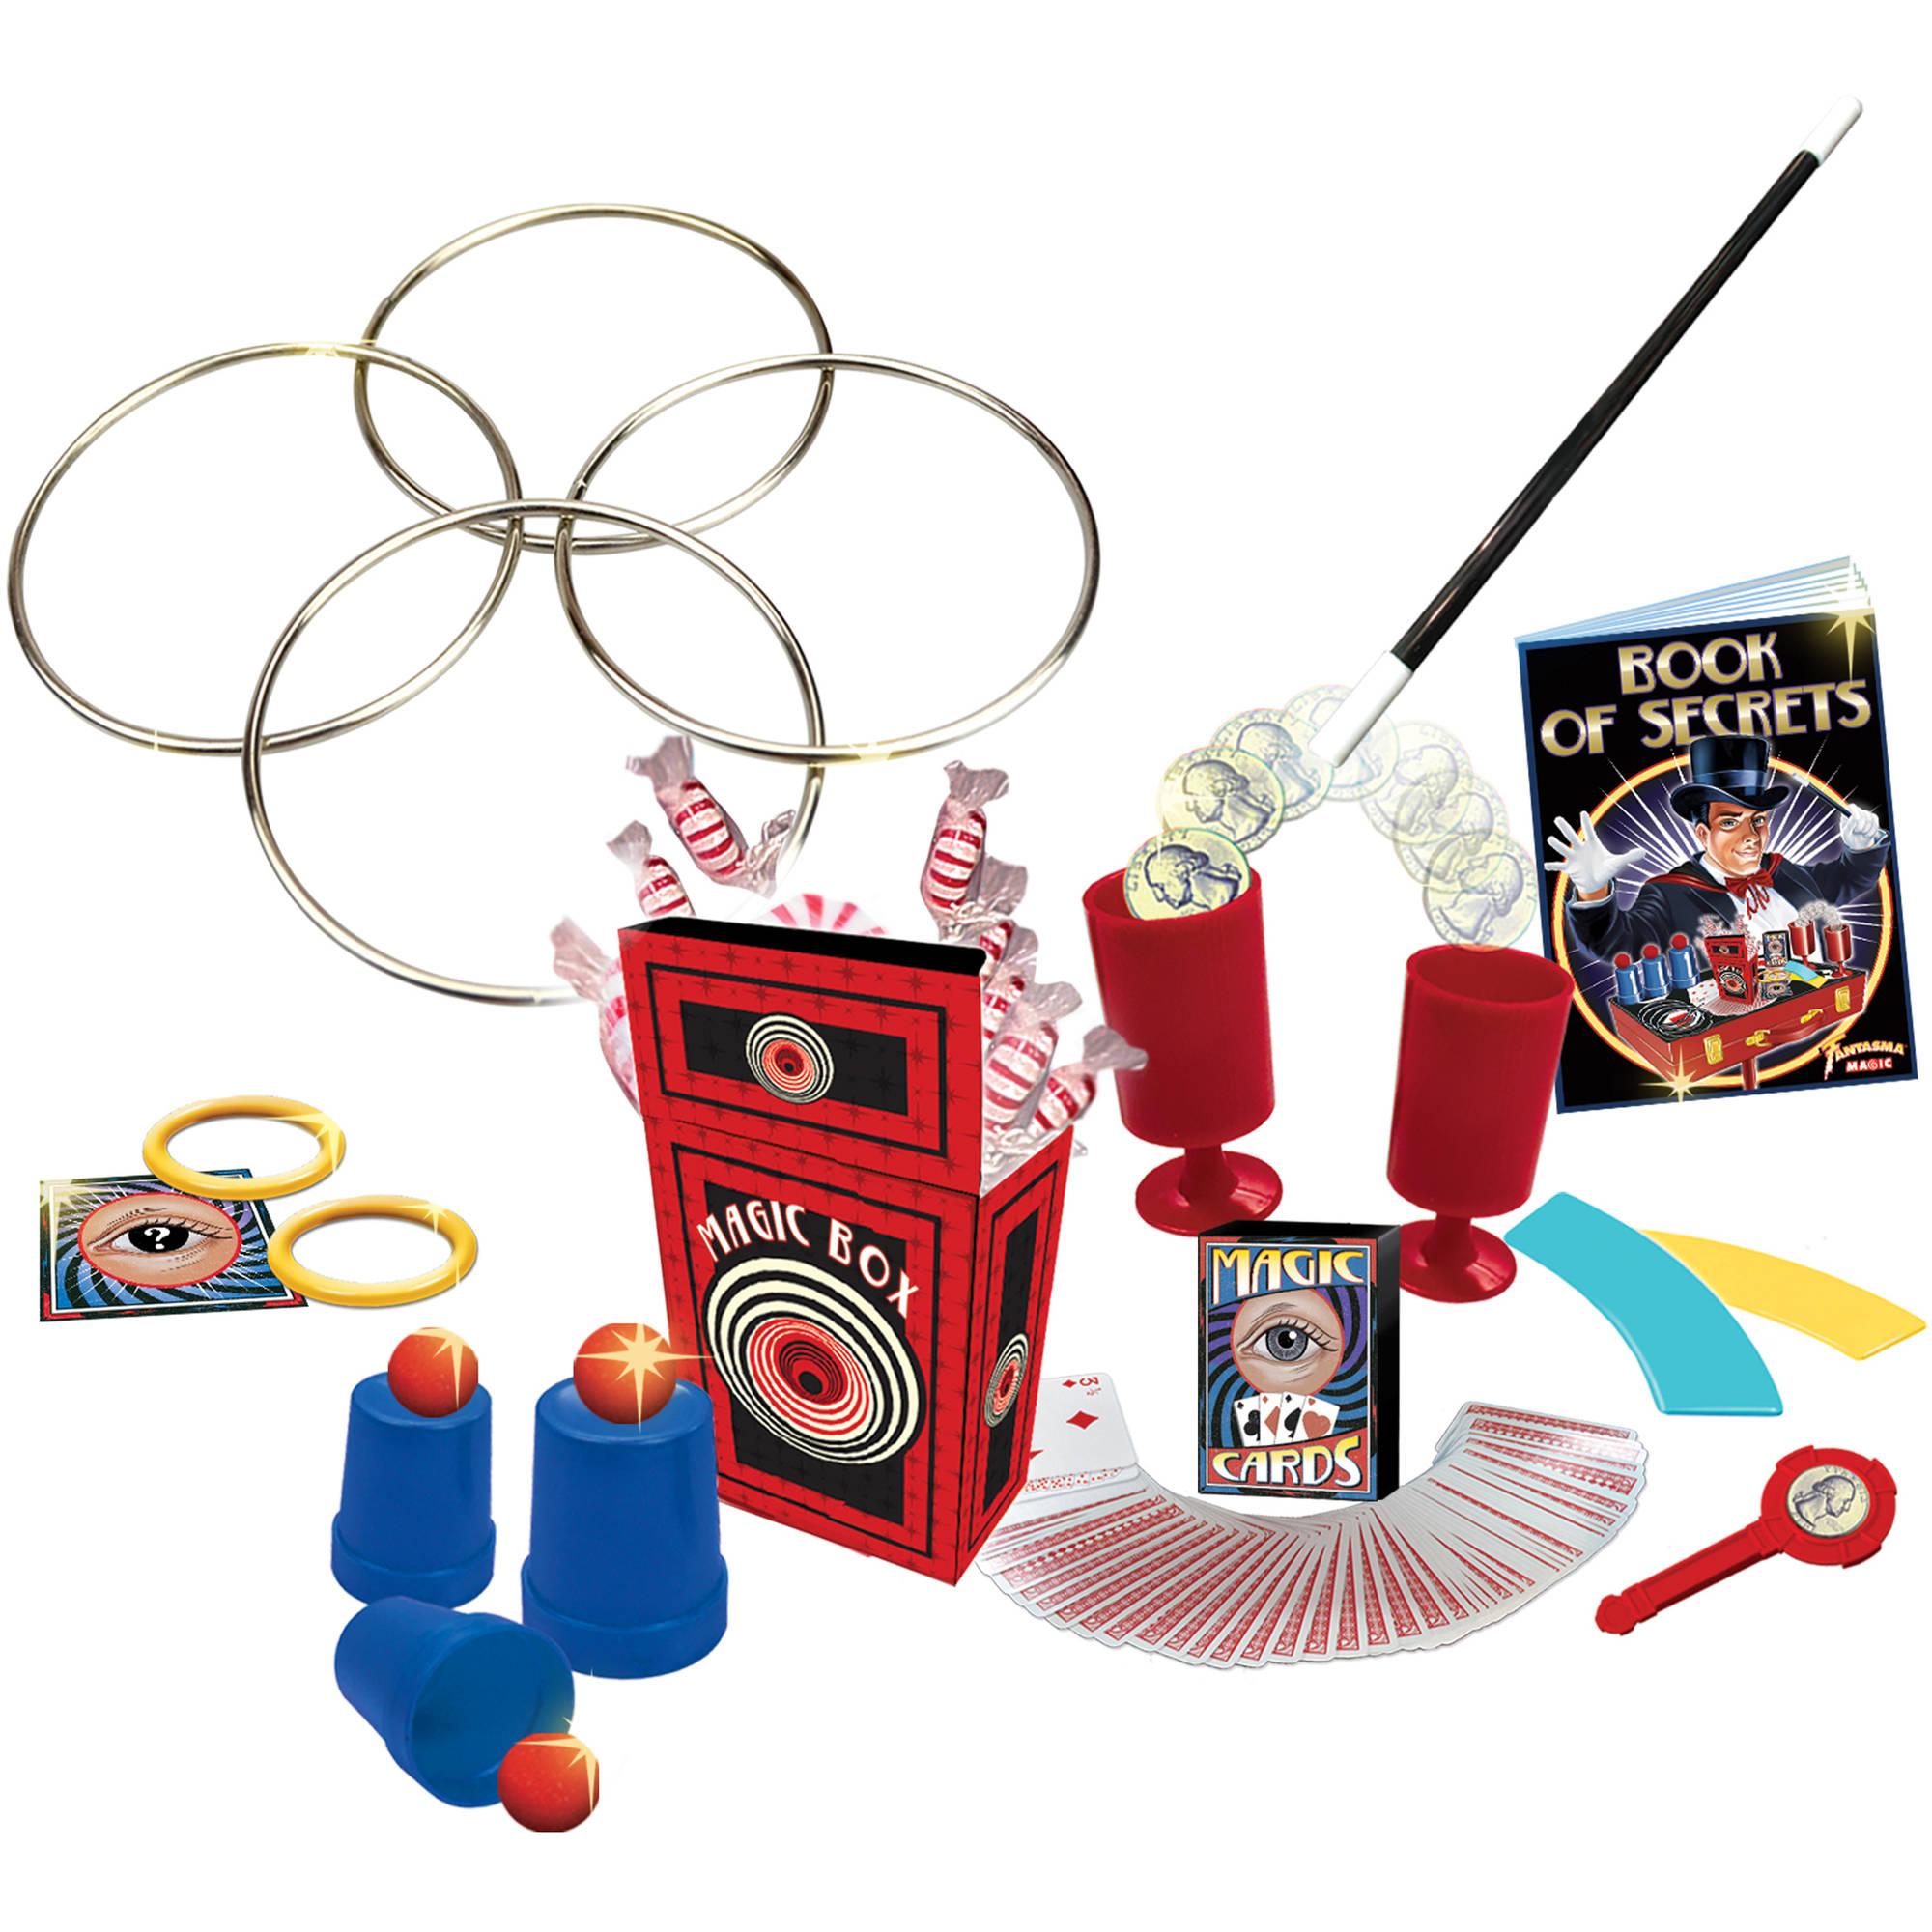 Fantasma Magic 150 Tricks Retro Magic Table Set with Wooden Carrying Case